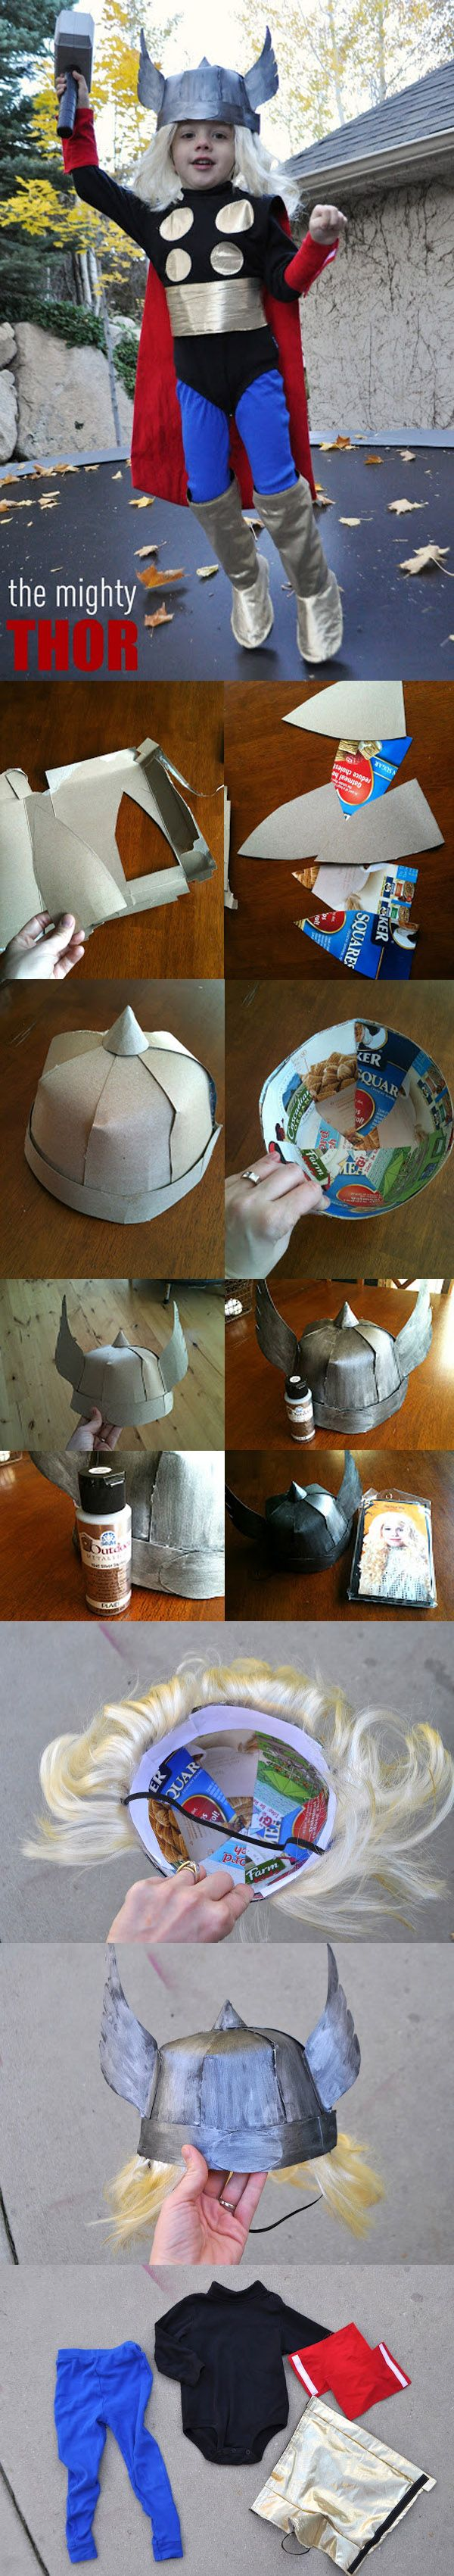 DIY  ::  Thor Costume ( http://www.iammommahearmeroar.net/2011/10/thor-costume-for-dailybuzz-moms-9x9.html )